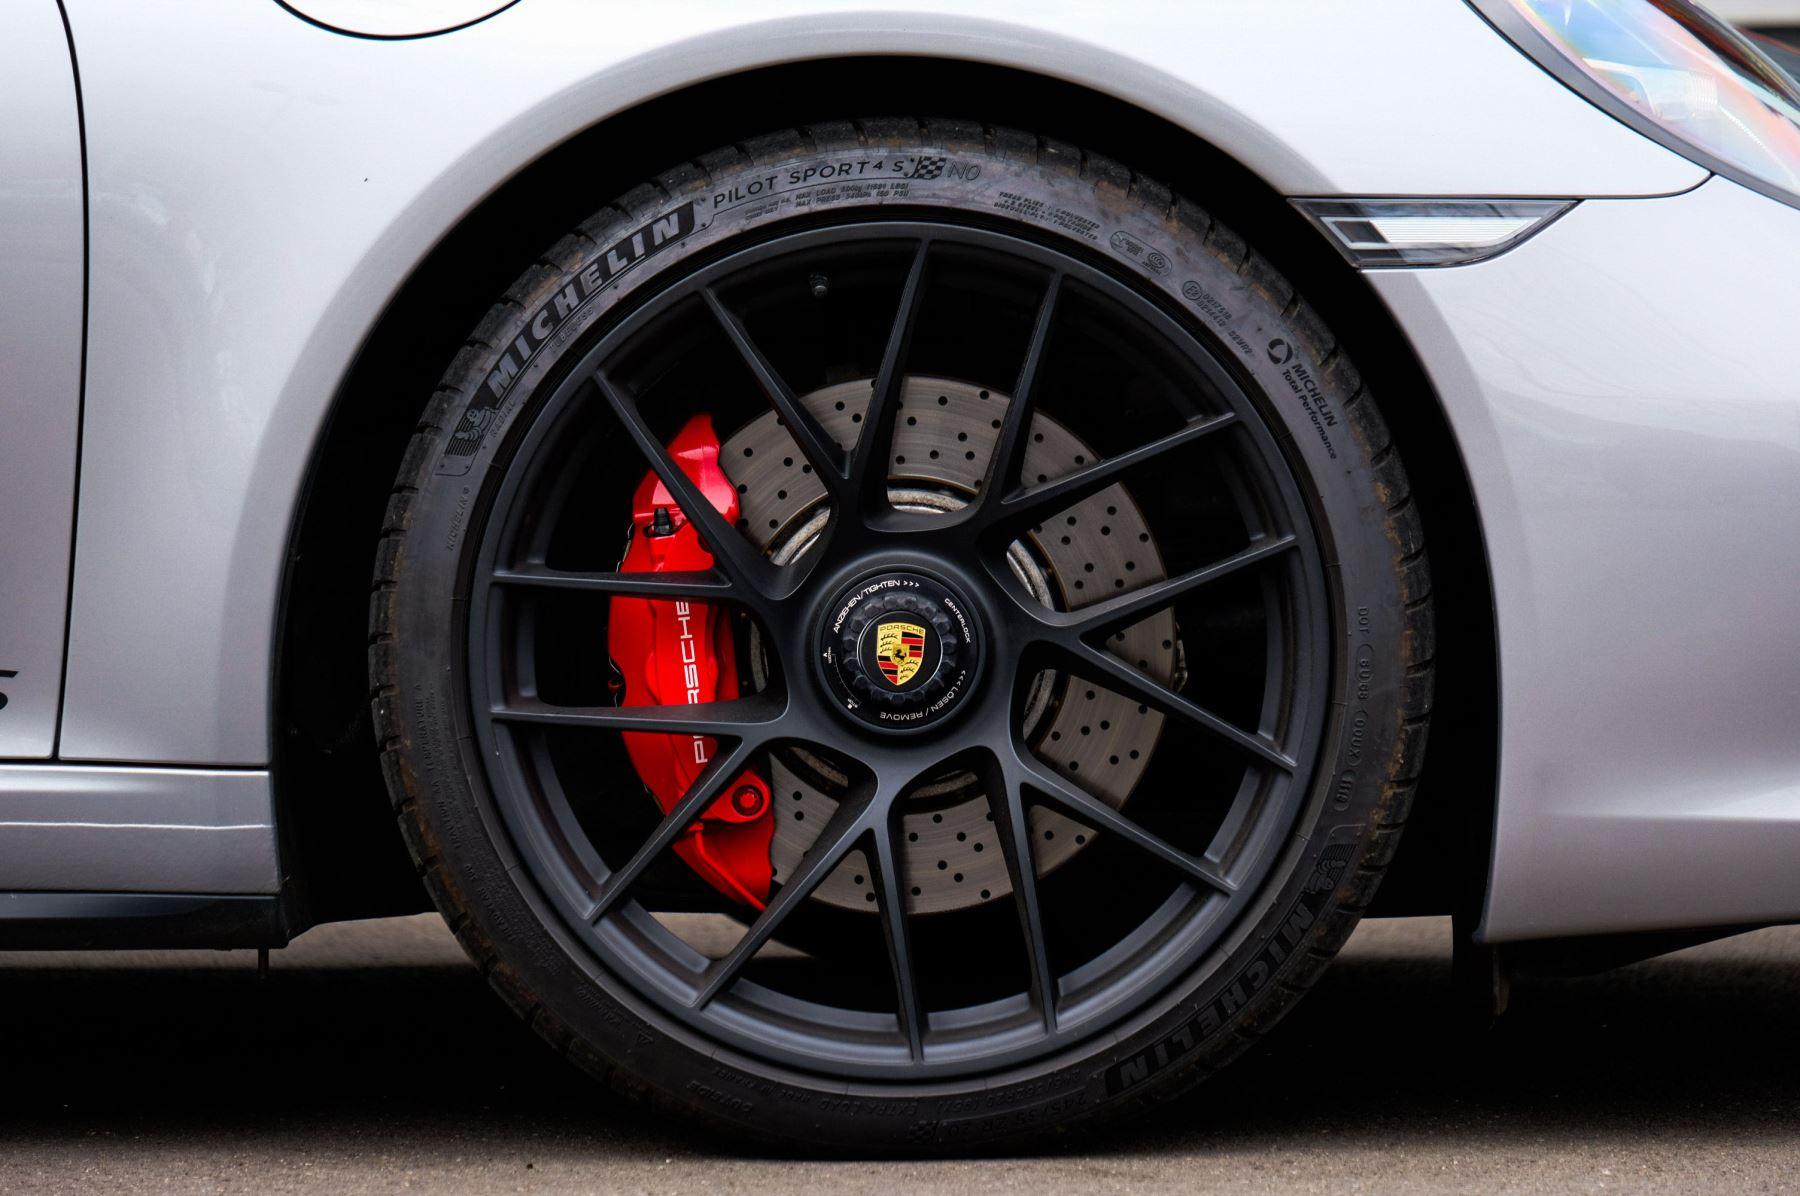 Porsche 911 TARGA 4 GTS - PDK - SPORT DESIGN PACKAGE - GTS INTERIOR PACKAGE image 8